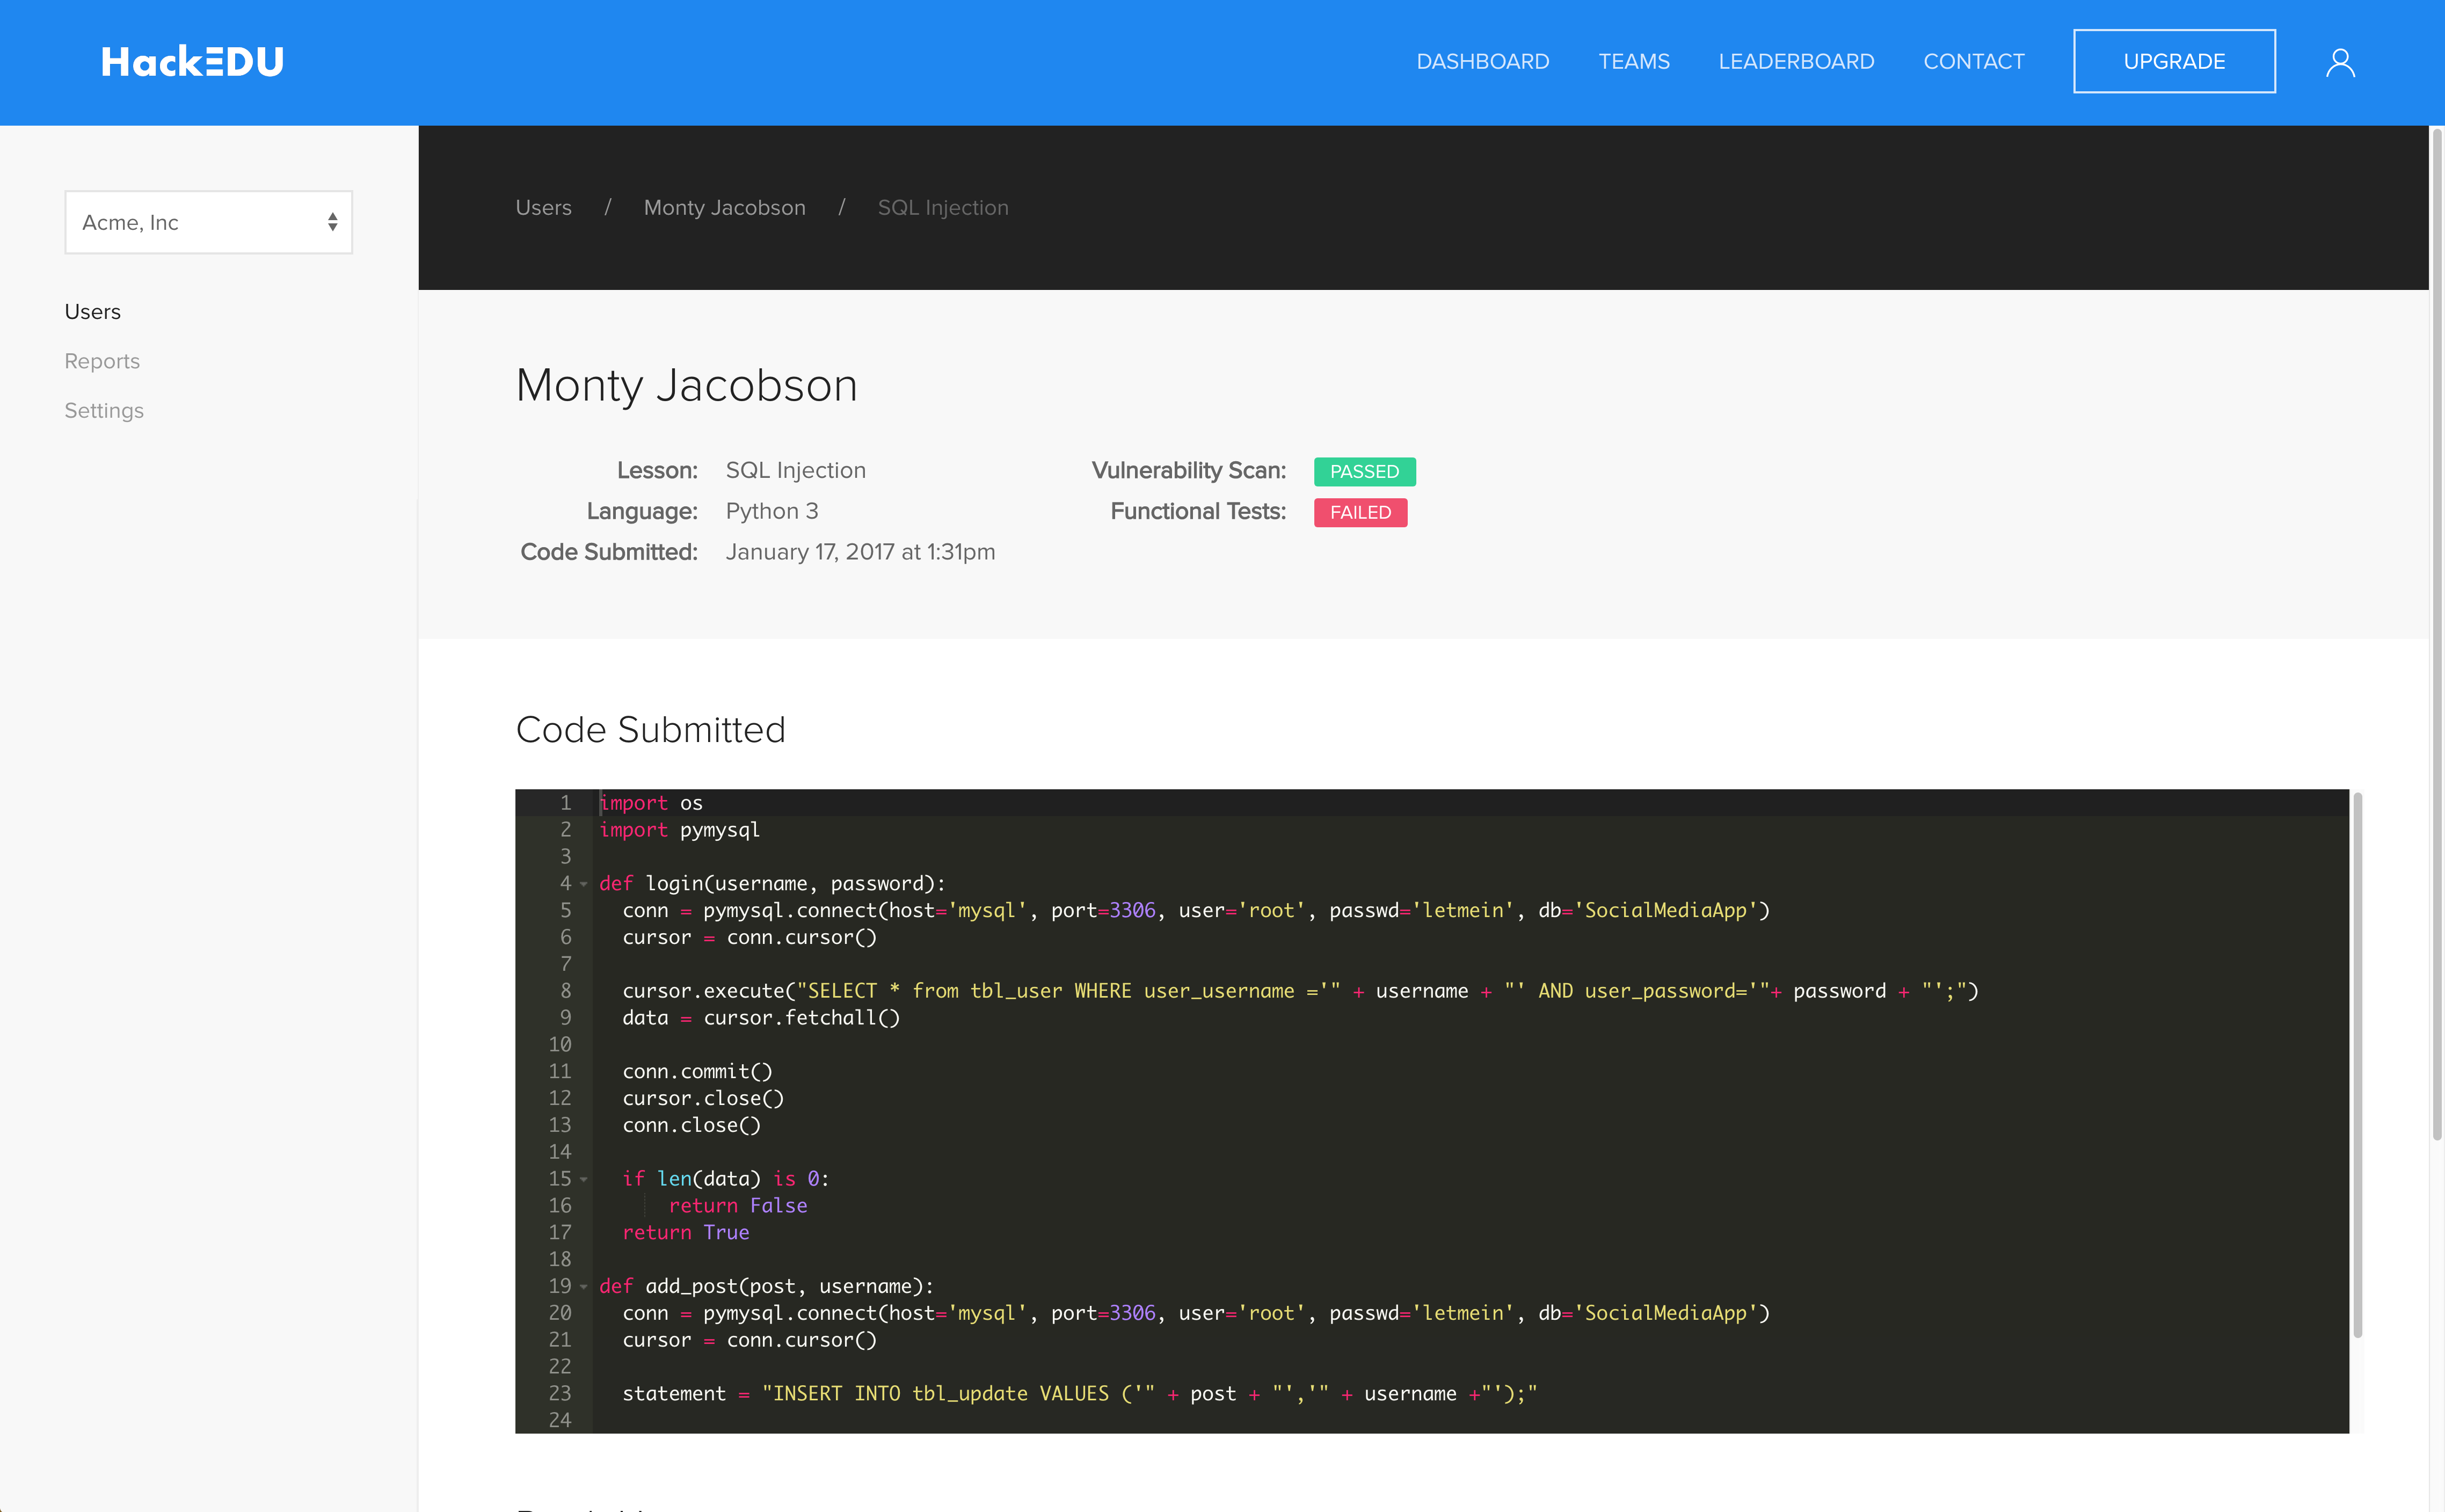 HackEDU code evaluation